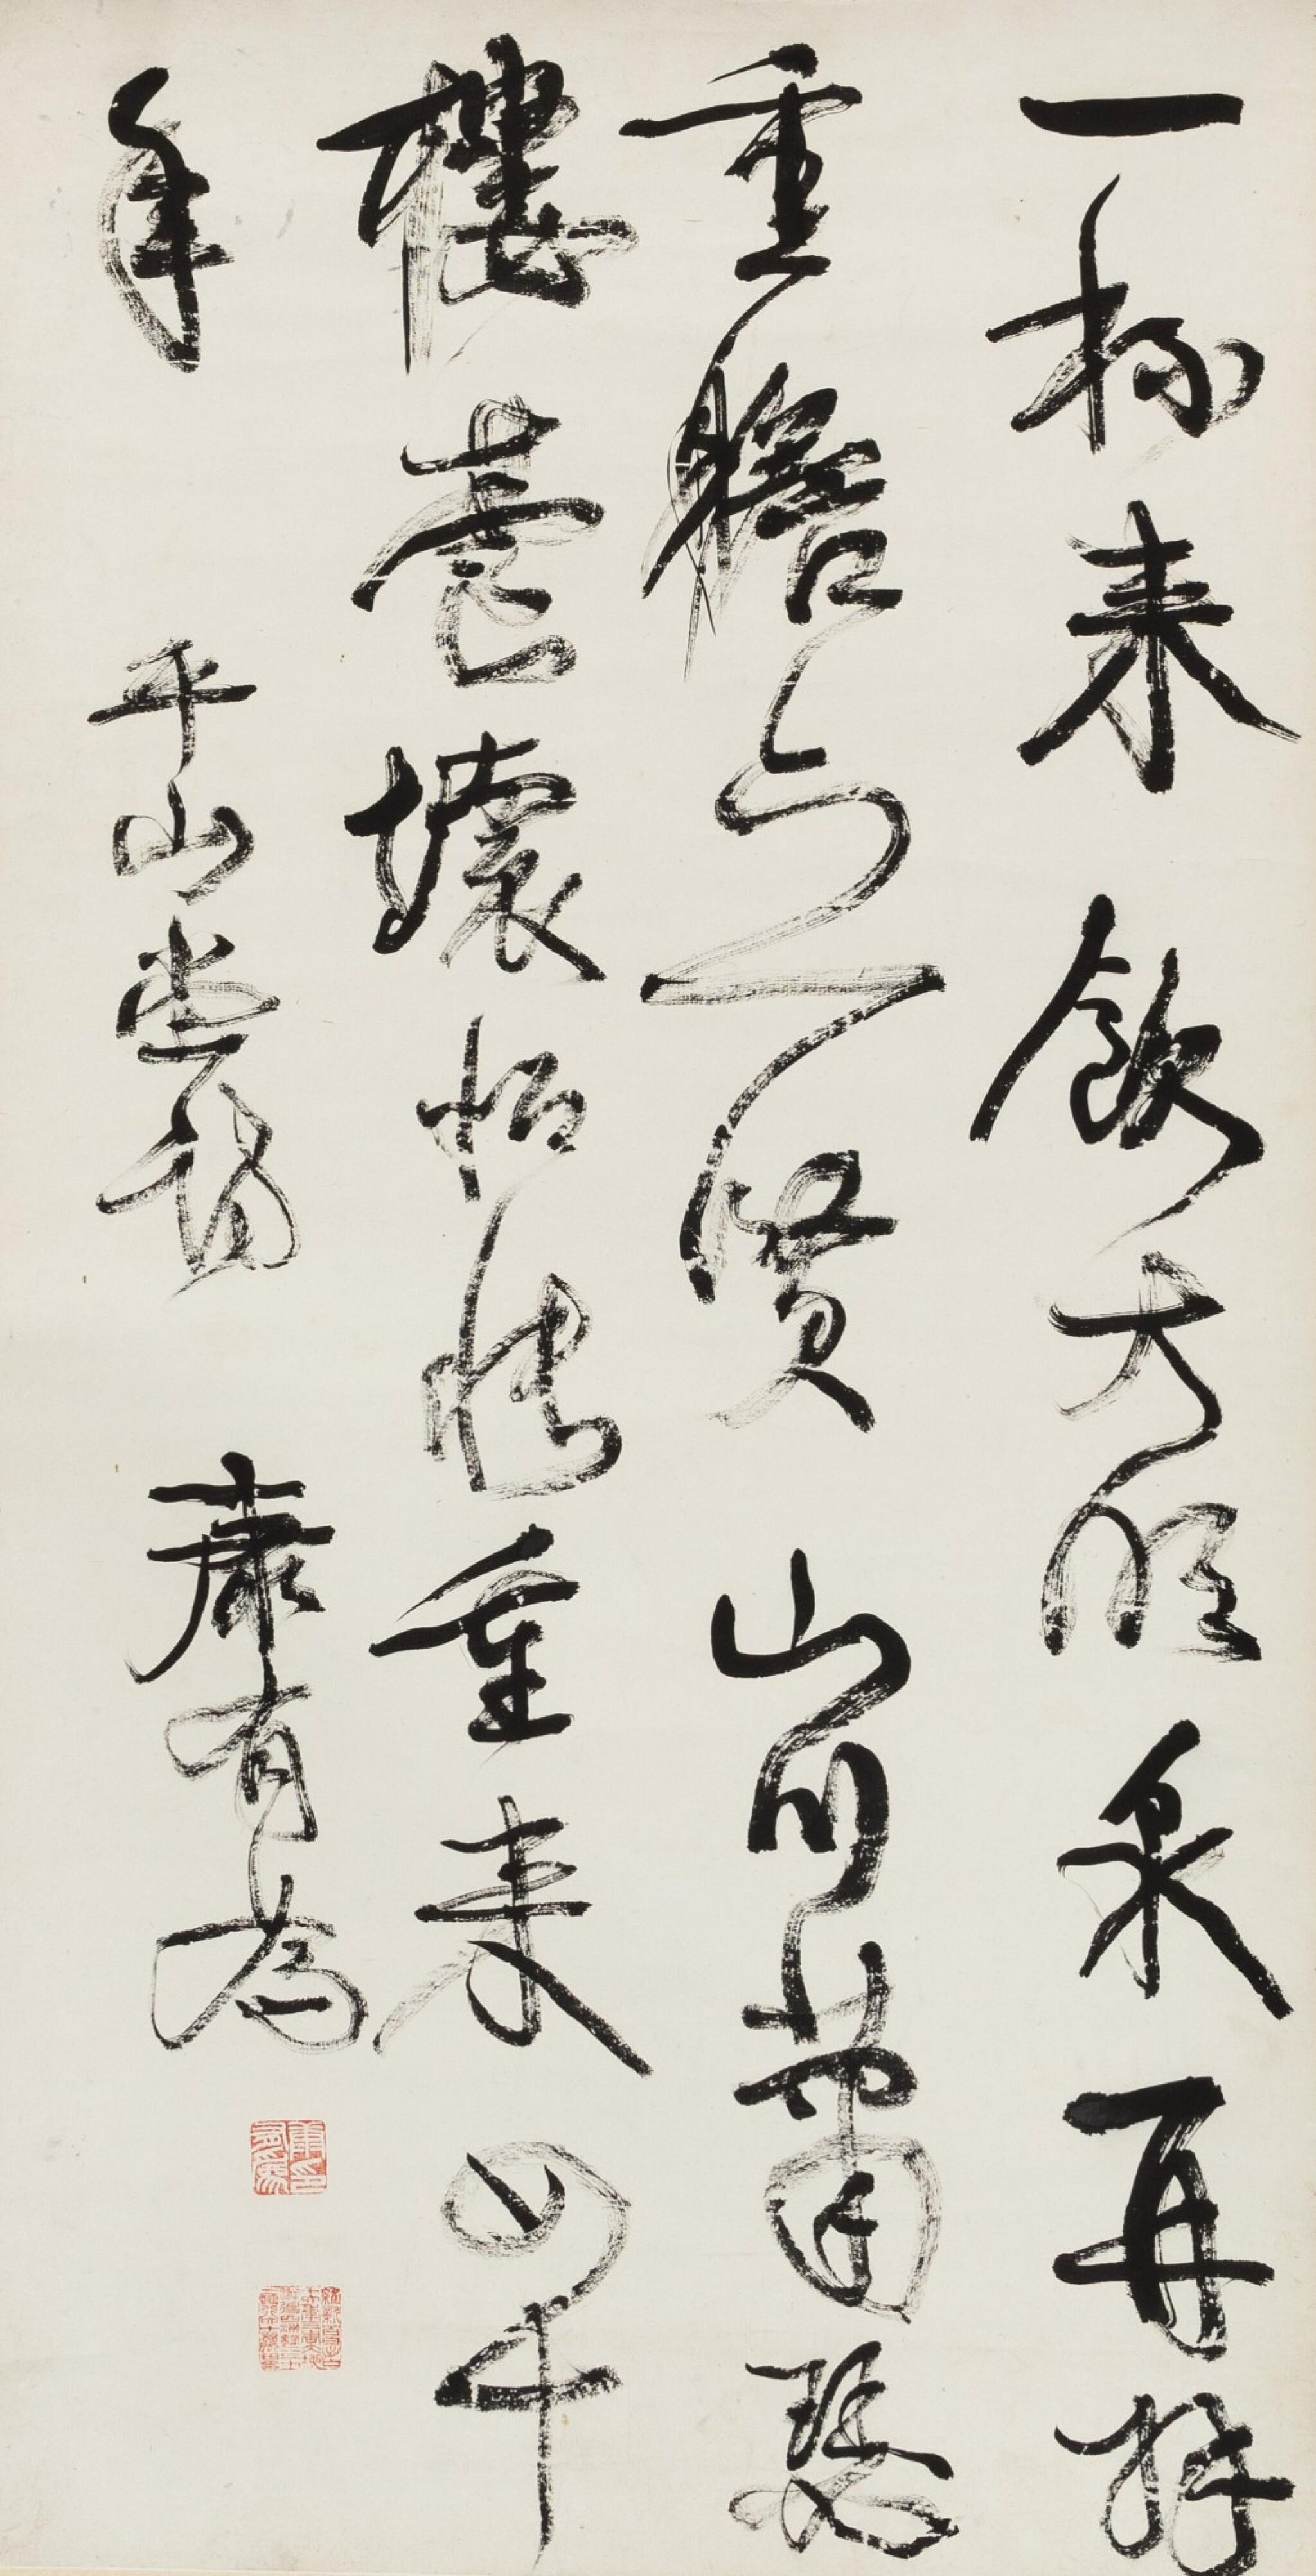 View 1 of Lot 132. Kang Youwei (1858-1927) Poème en calligraphie de style courant | 康有為 行書詩句 | Kang Youwei (1858-1927) Poem in Running Script.